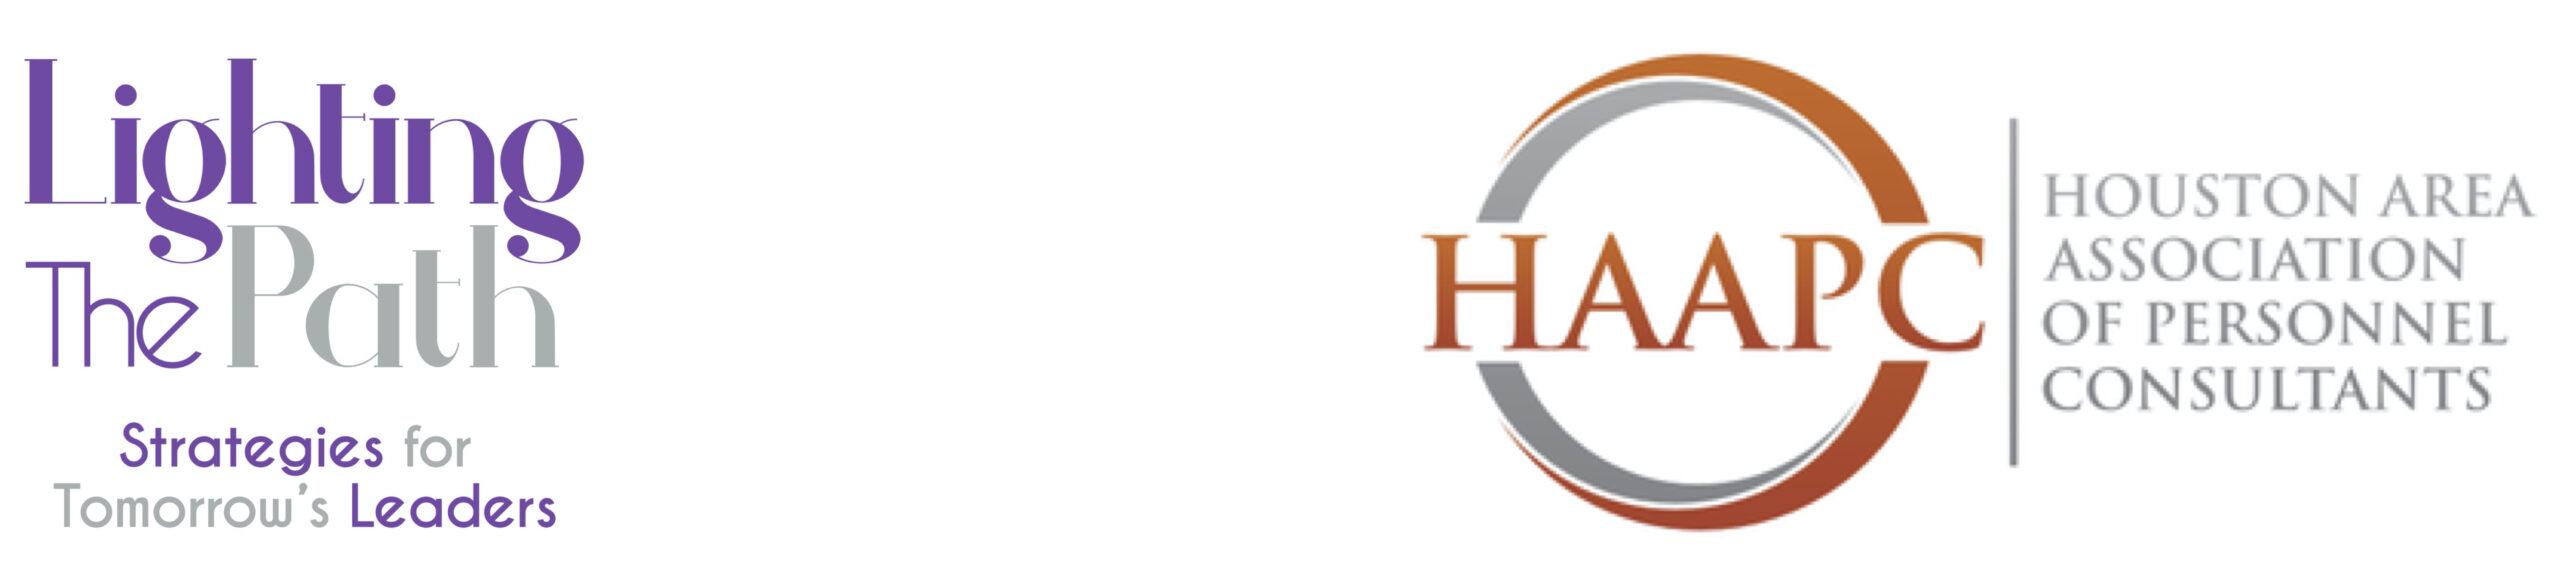 Lighting the Path and HAAPC logos